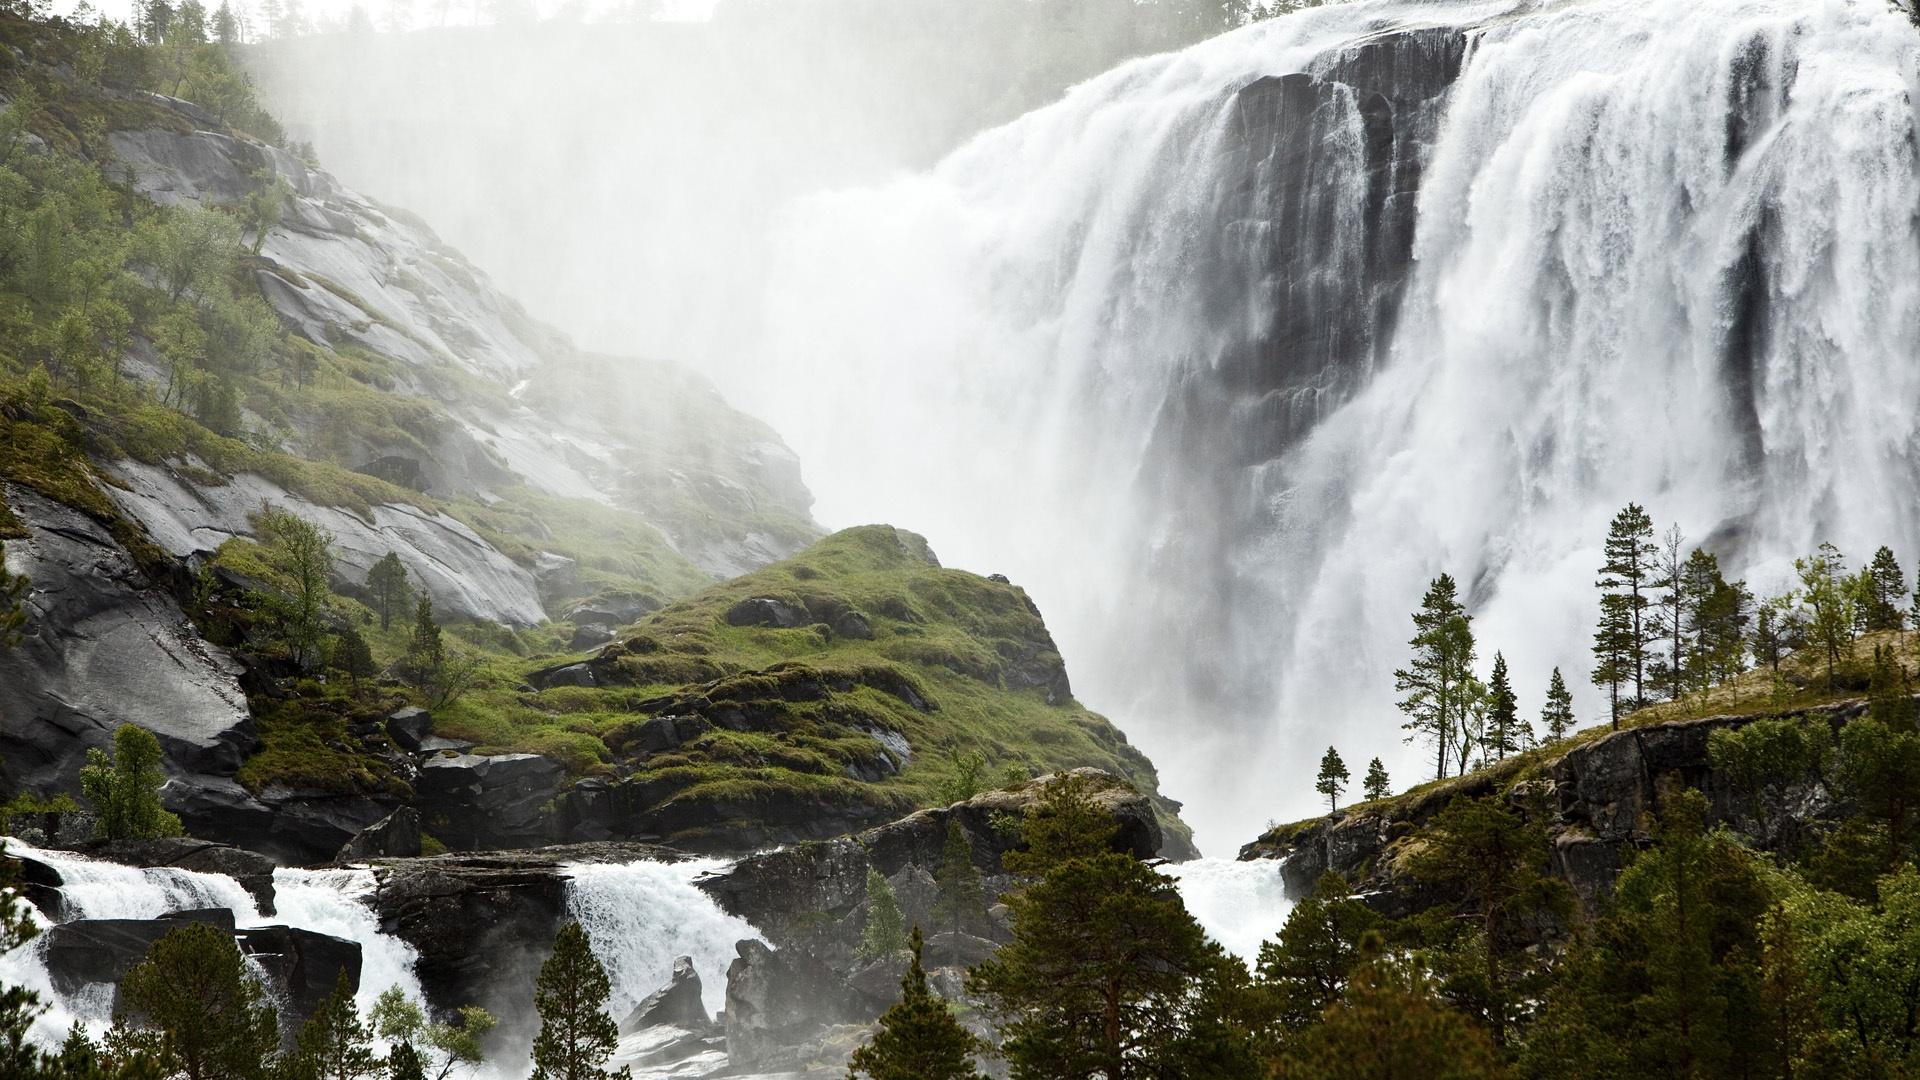 Wallpaper Spectacular Waterfall Small Sami Fishing Village